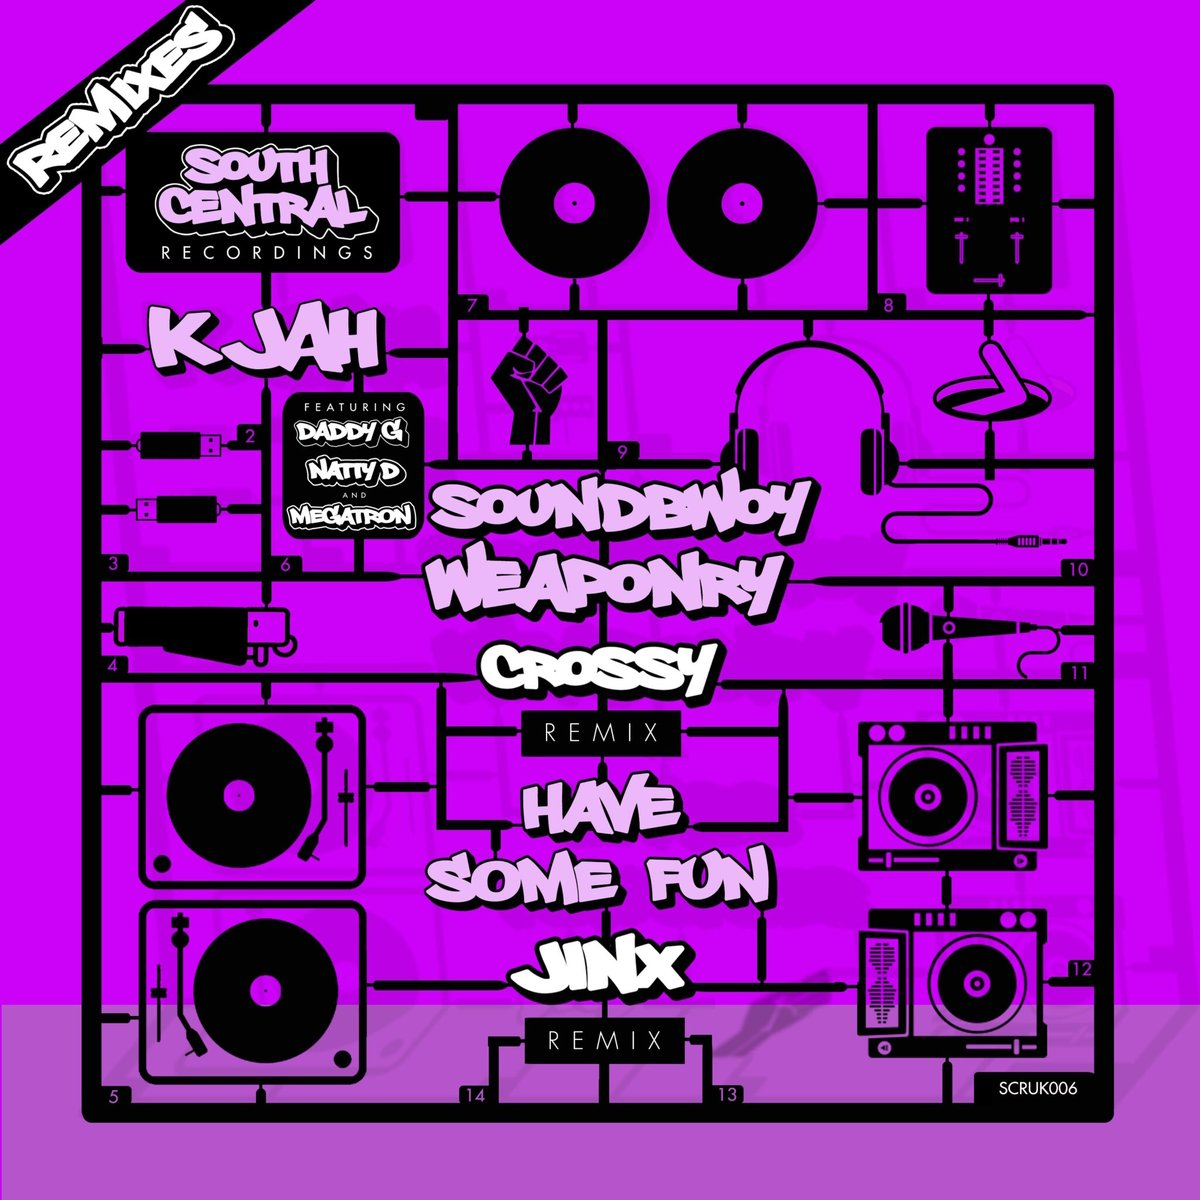 K Jah – Soundbwoy Weaponry/Have #Some Fun #Remixes – #South #Central #Recordings  #2020K #August #boss #brings #central #Crossy #DaddyG #Featured #Fresh #jinx #KJah #Megatron #NattyD #NewReleases #recordings #Remixes #some #South #SouthCentralRecordings #Trending  ... https://t.co/9HeFEhu2N5